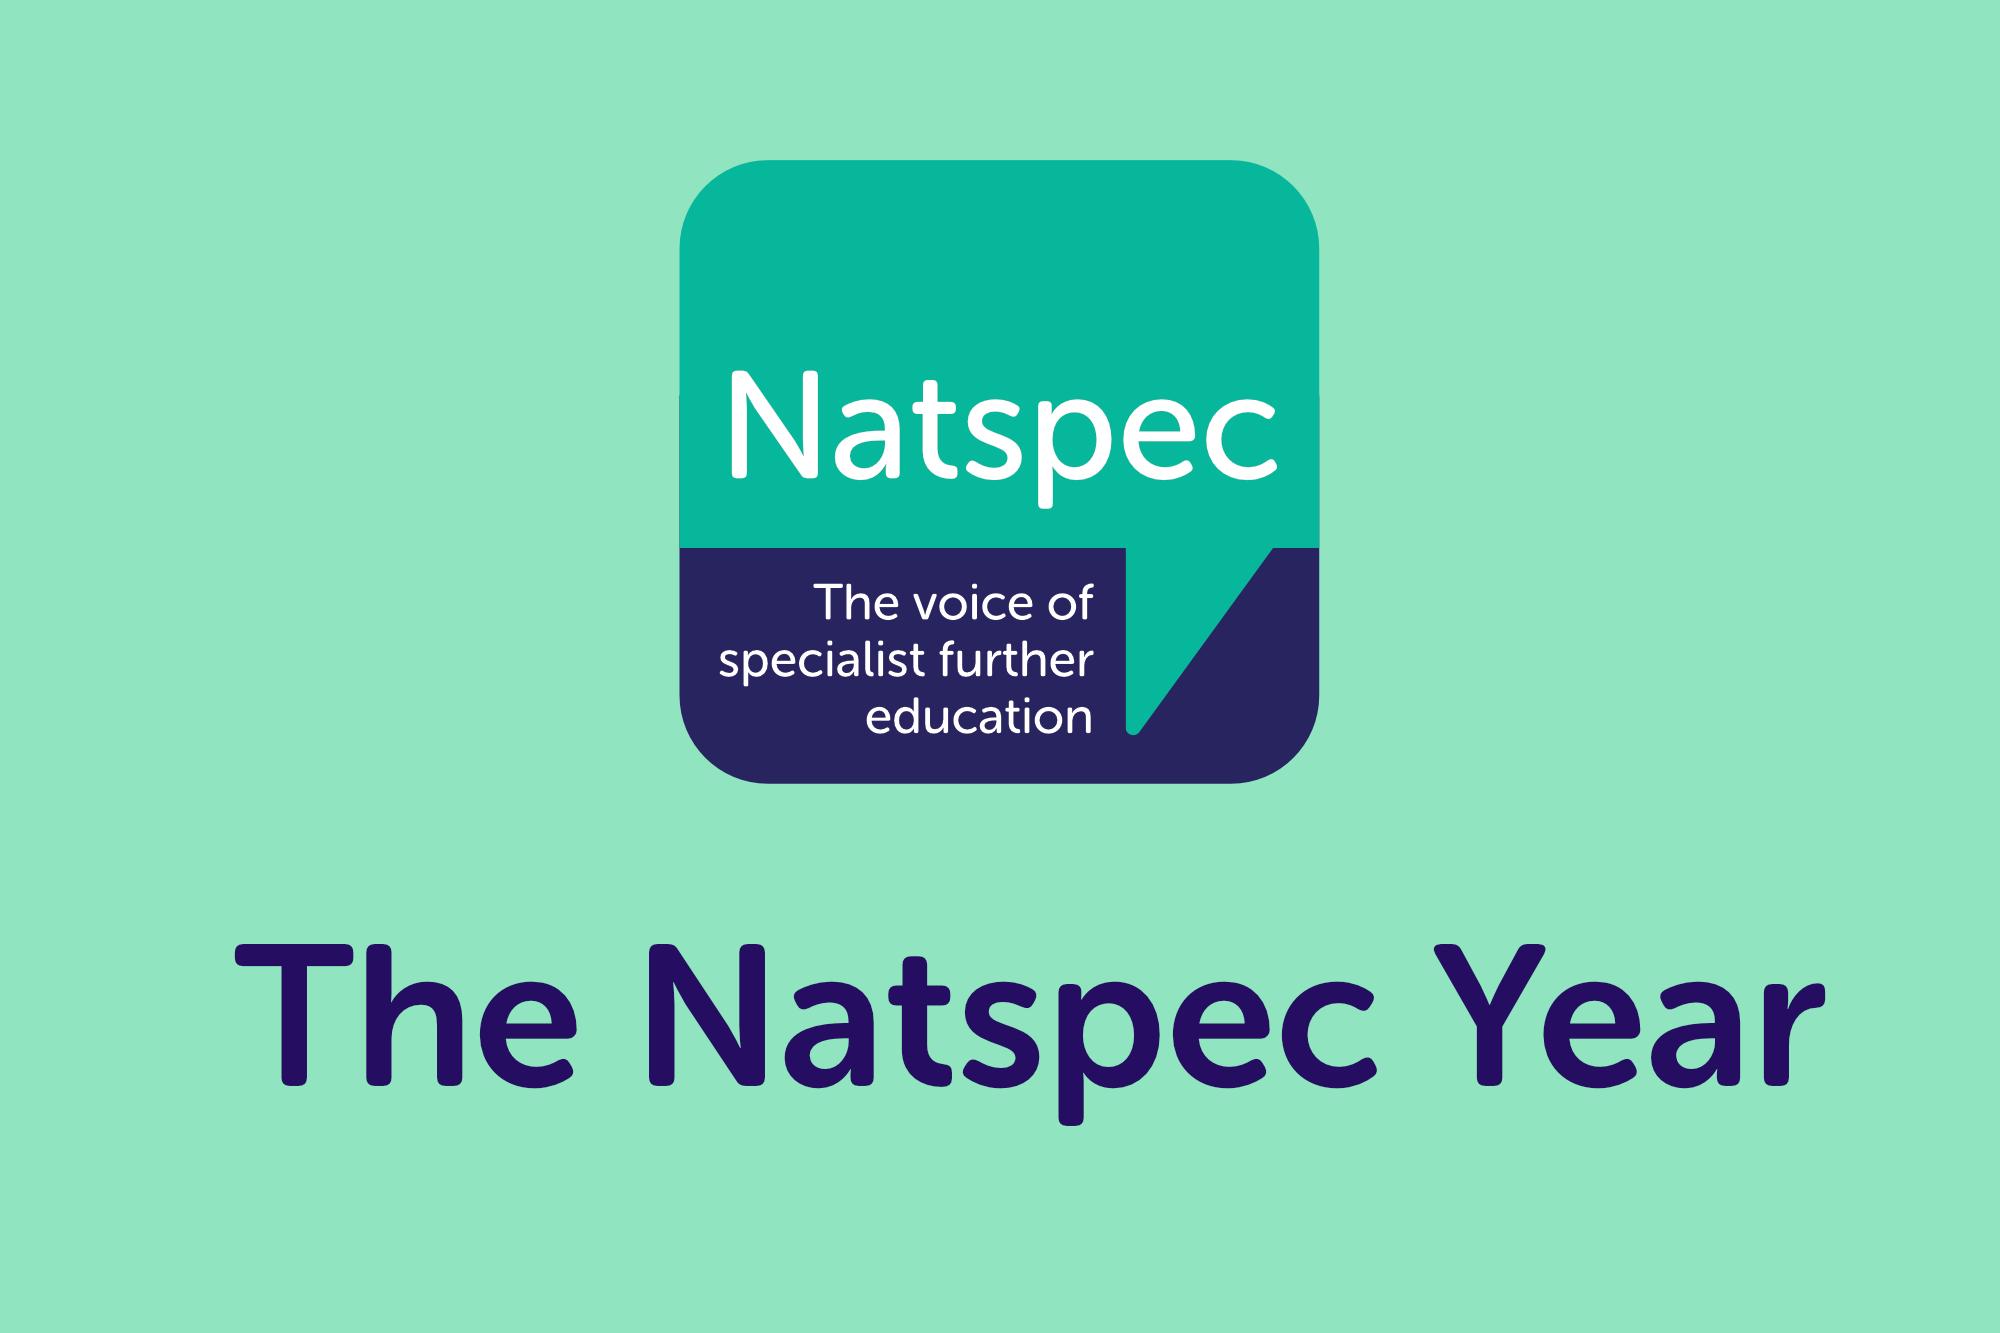 The Natspec Year